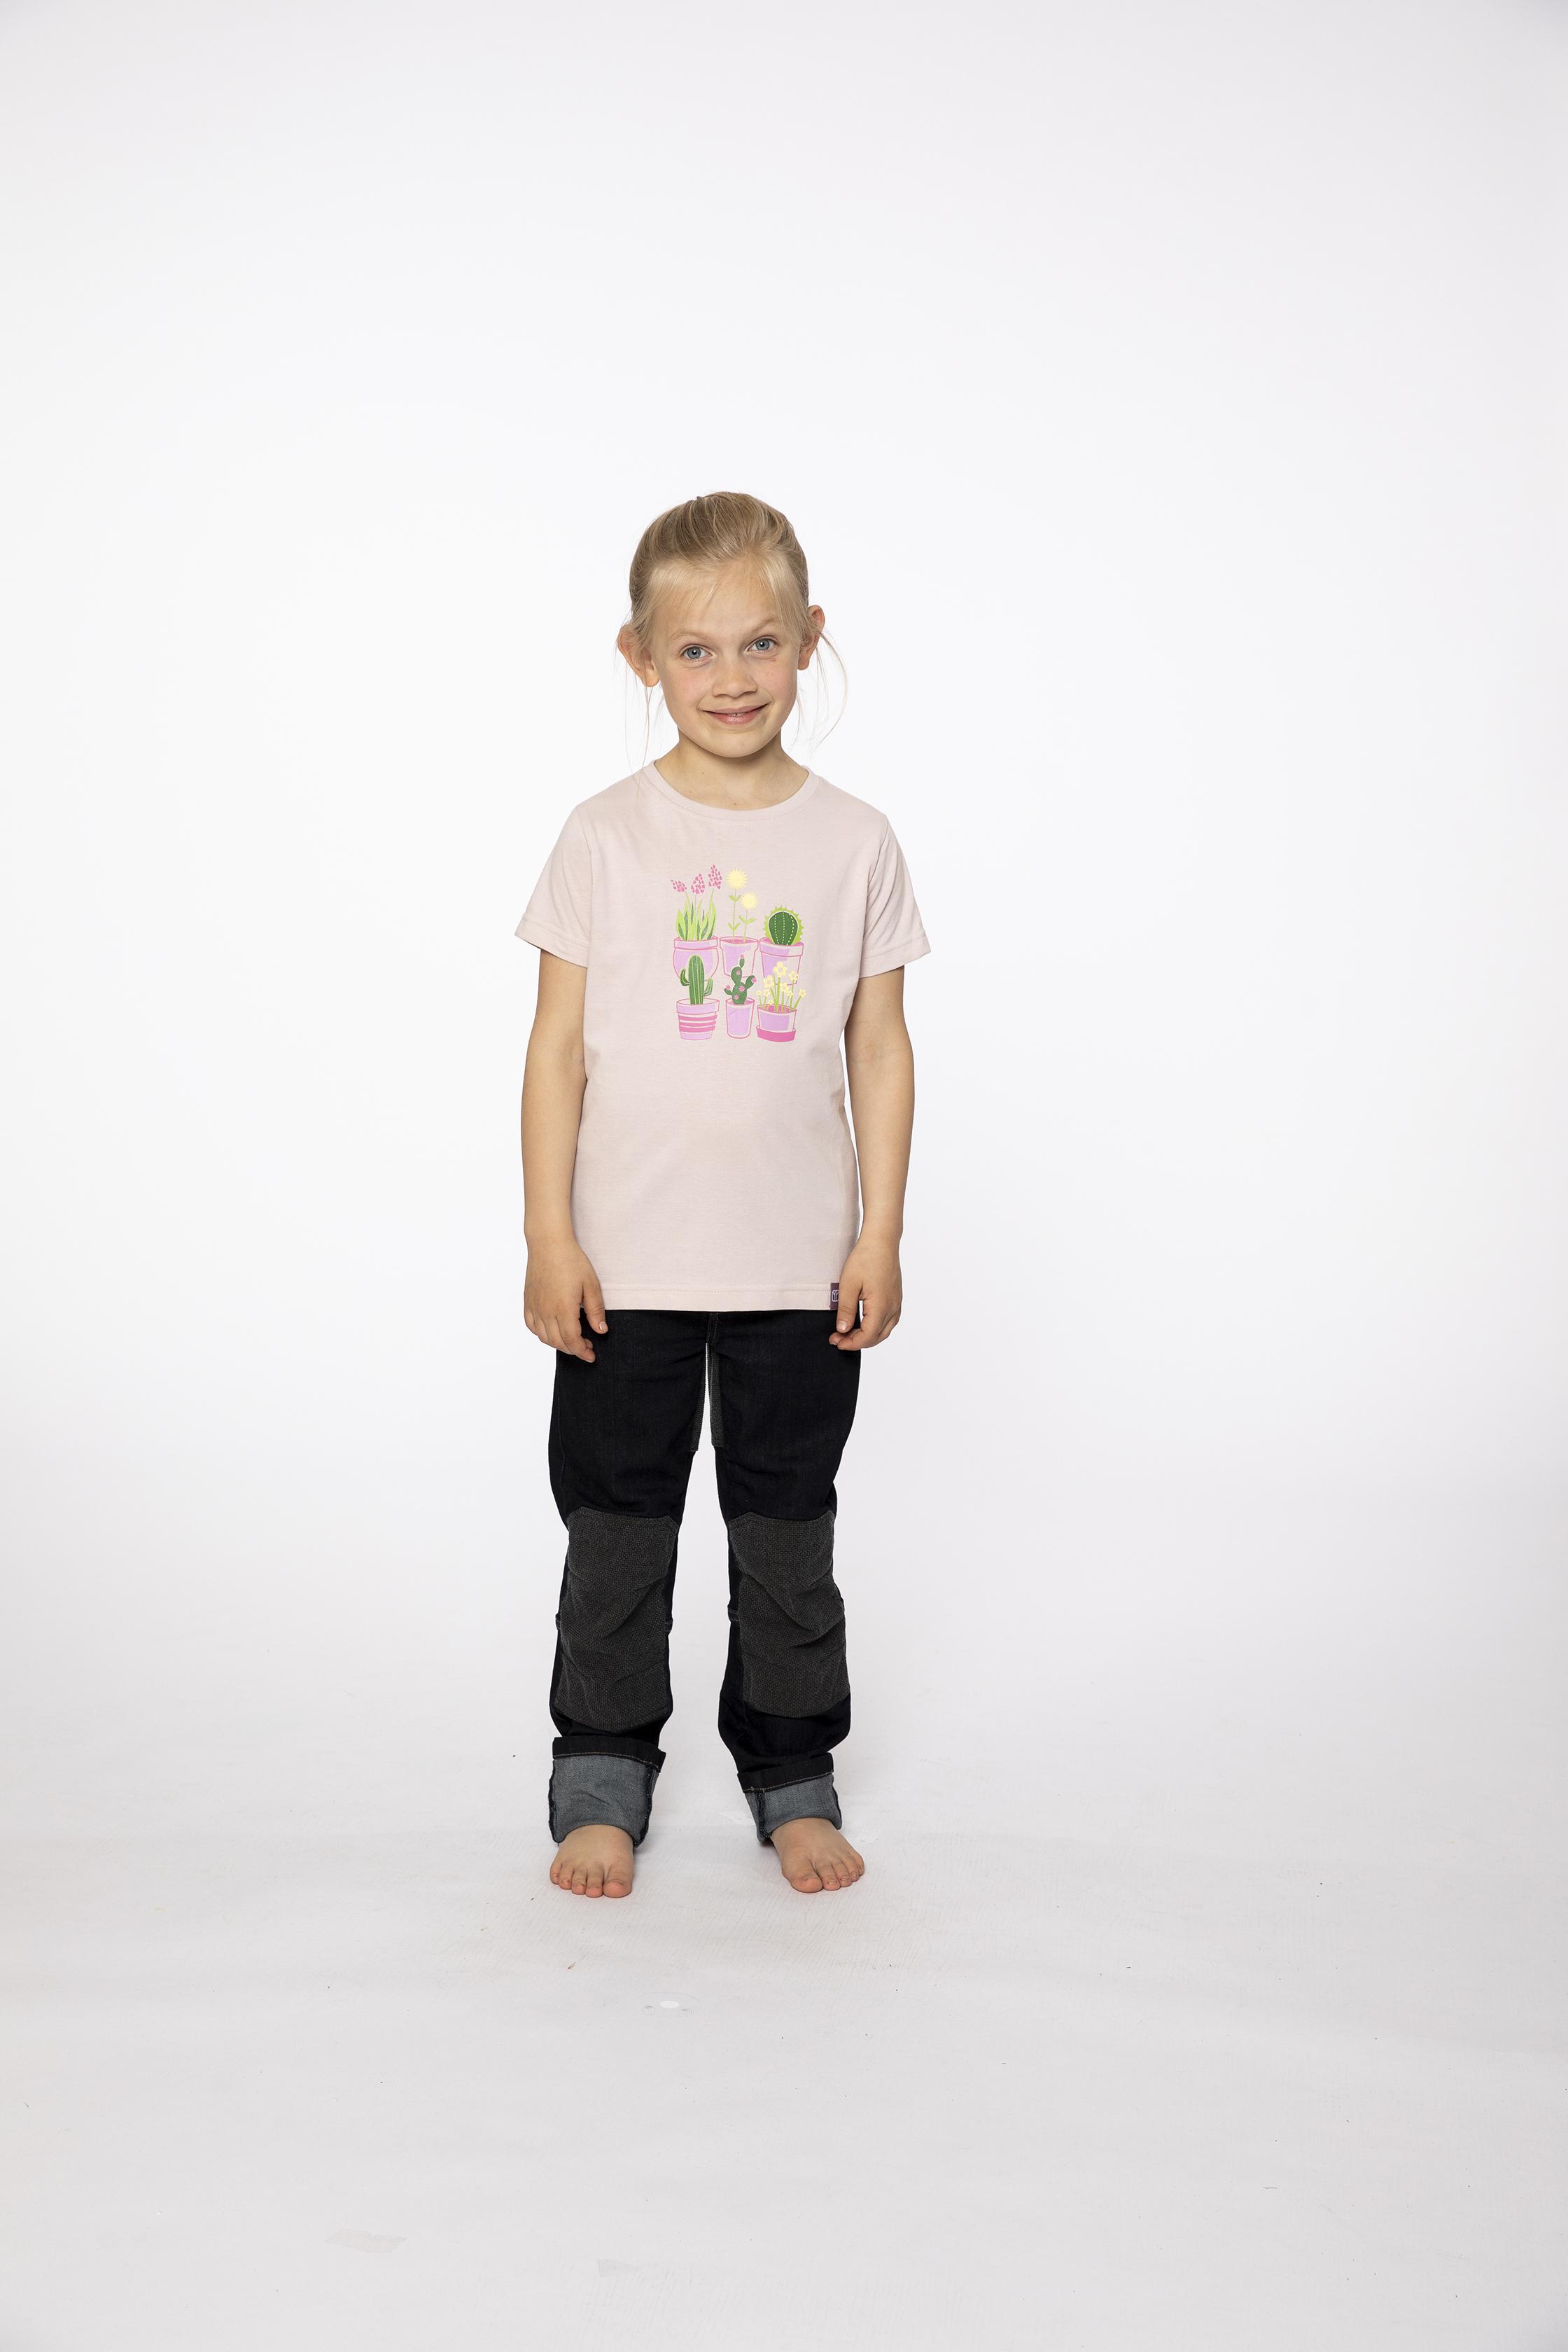 t-shirt:  PLANTSAREFRIENDS   denim pants:  BESTBOY